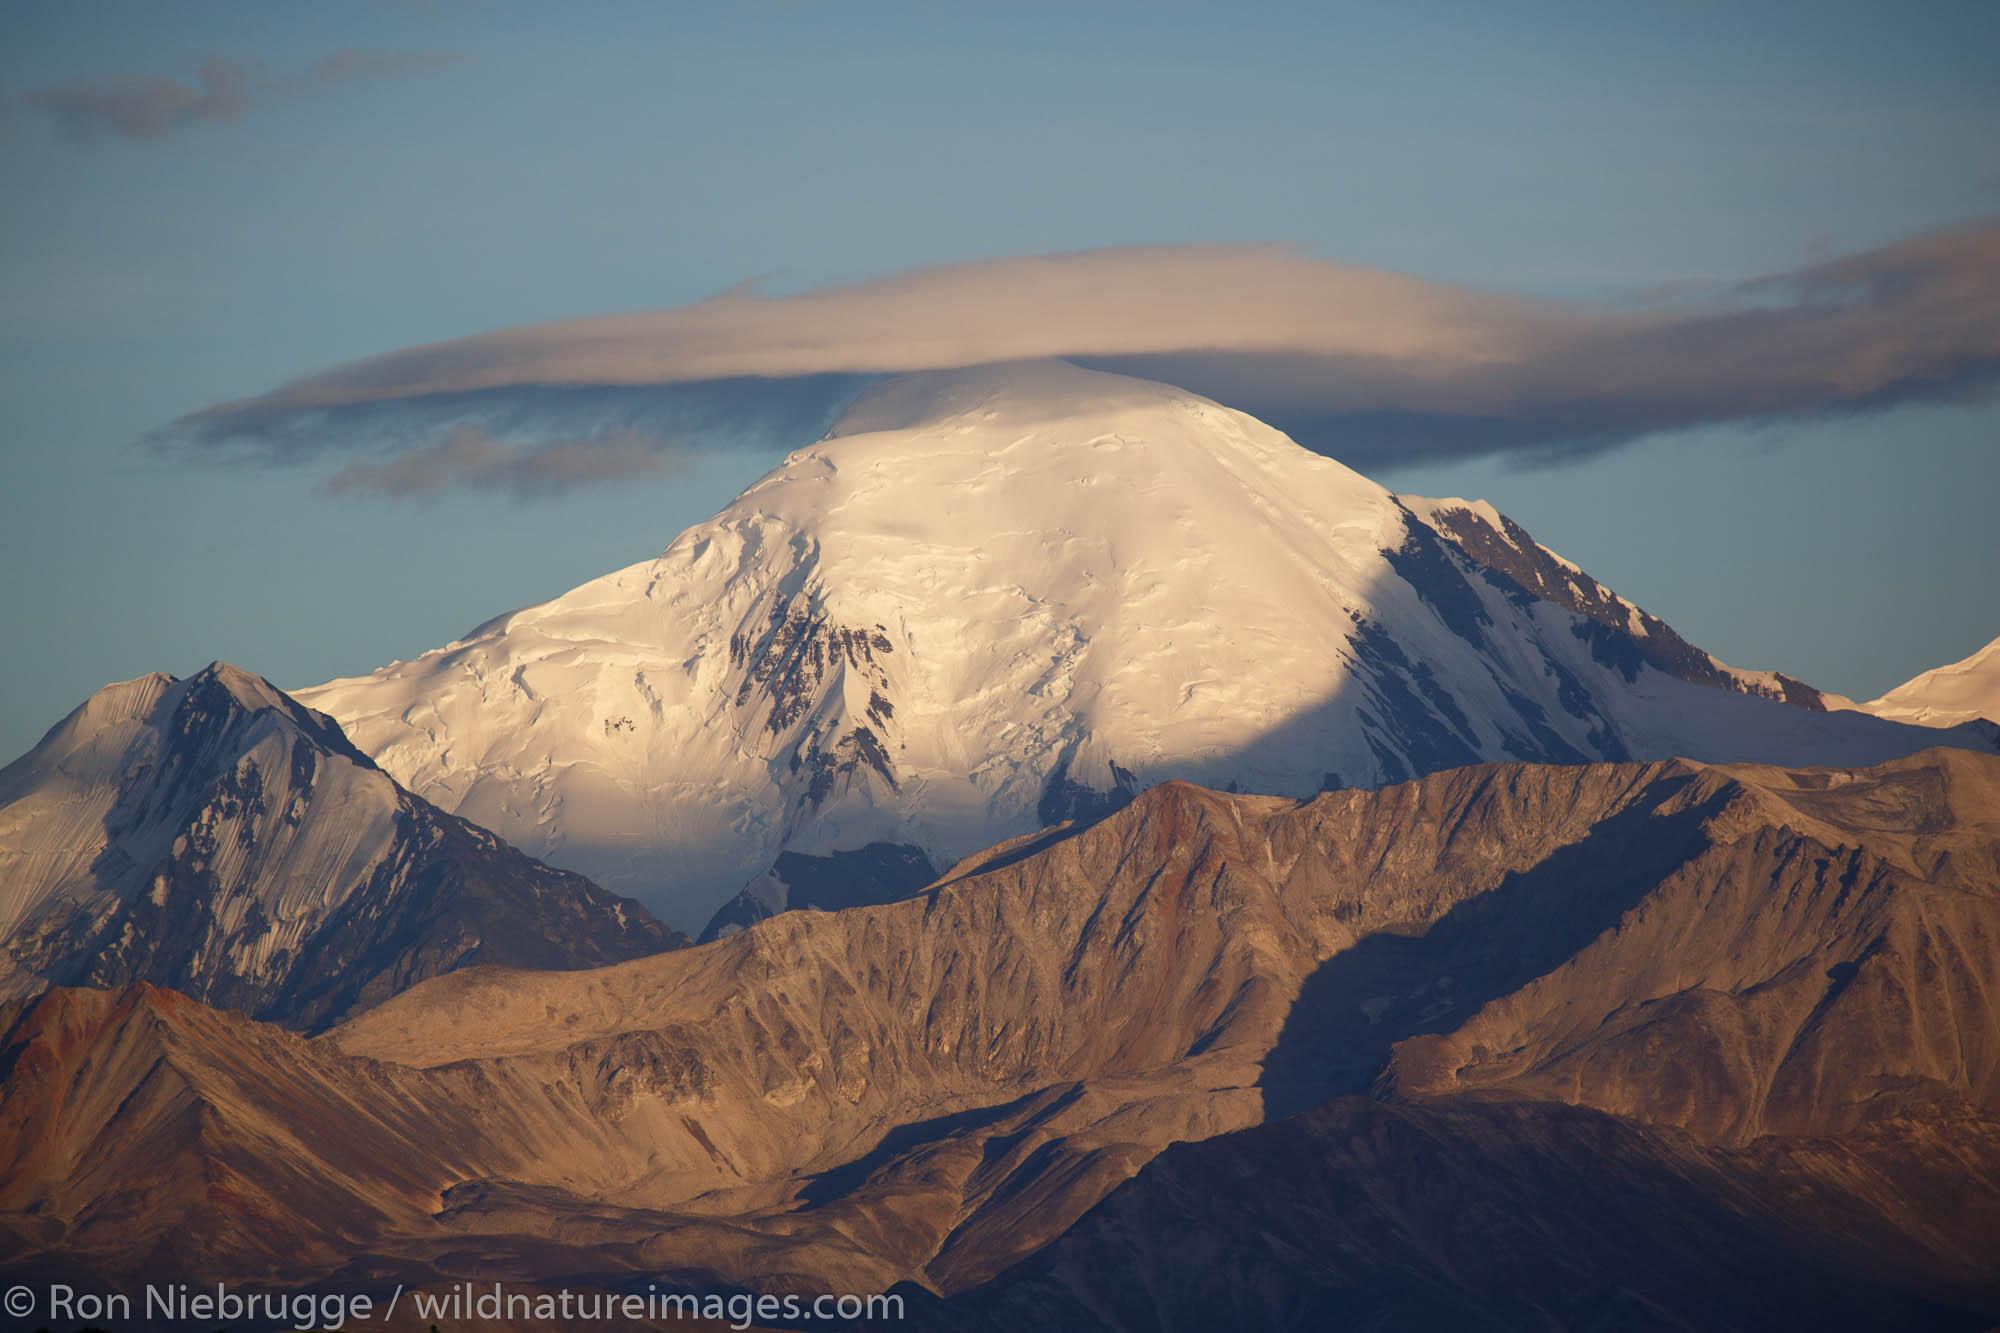 Lenticularis cloud forms over the Alaska Range, Denali National Park, Alaska.